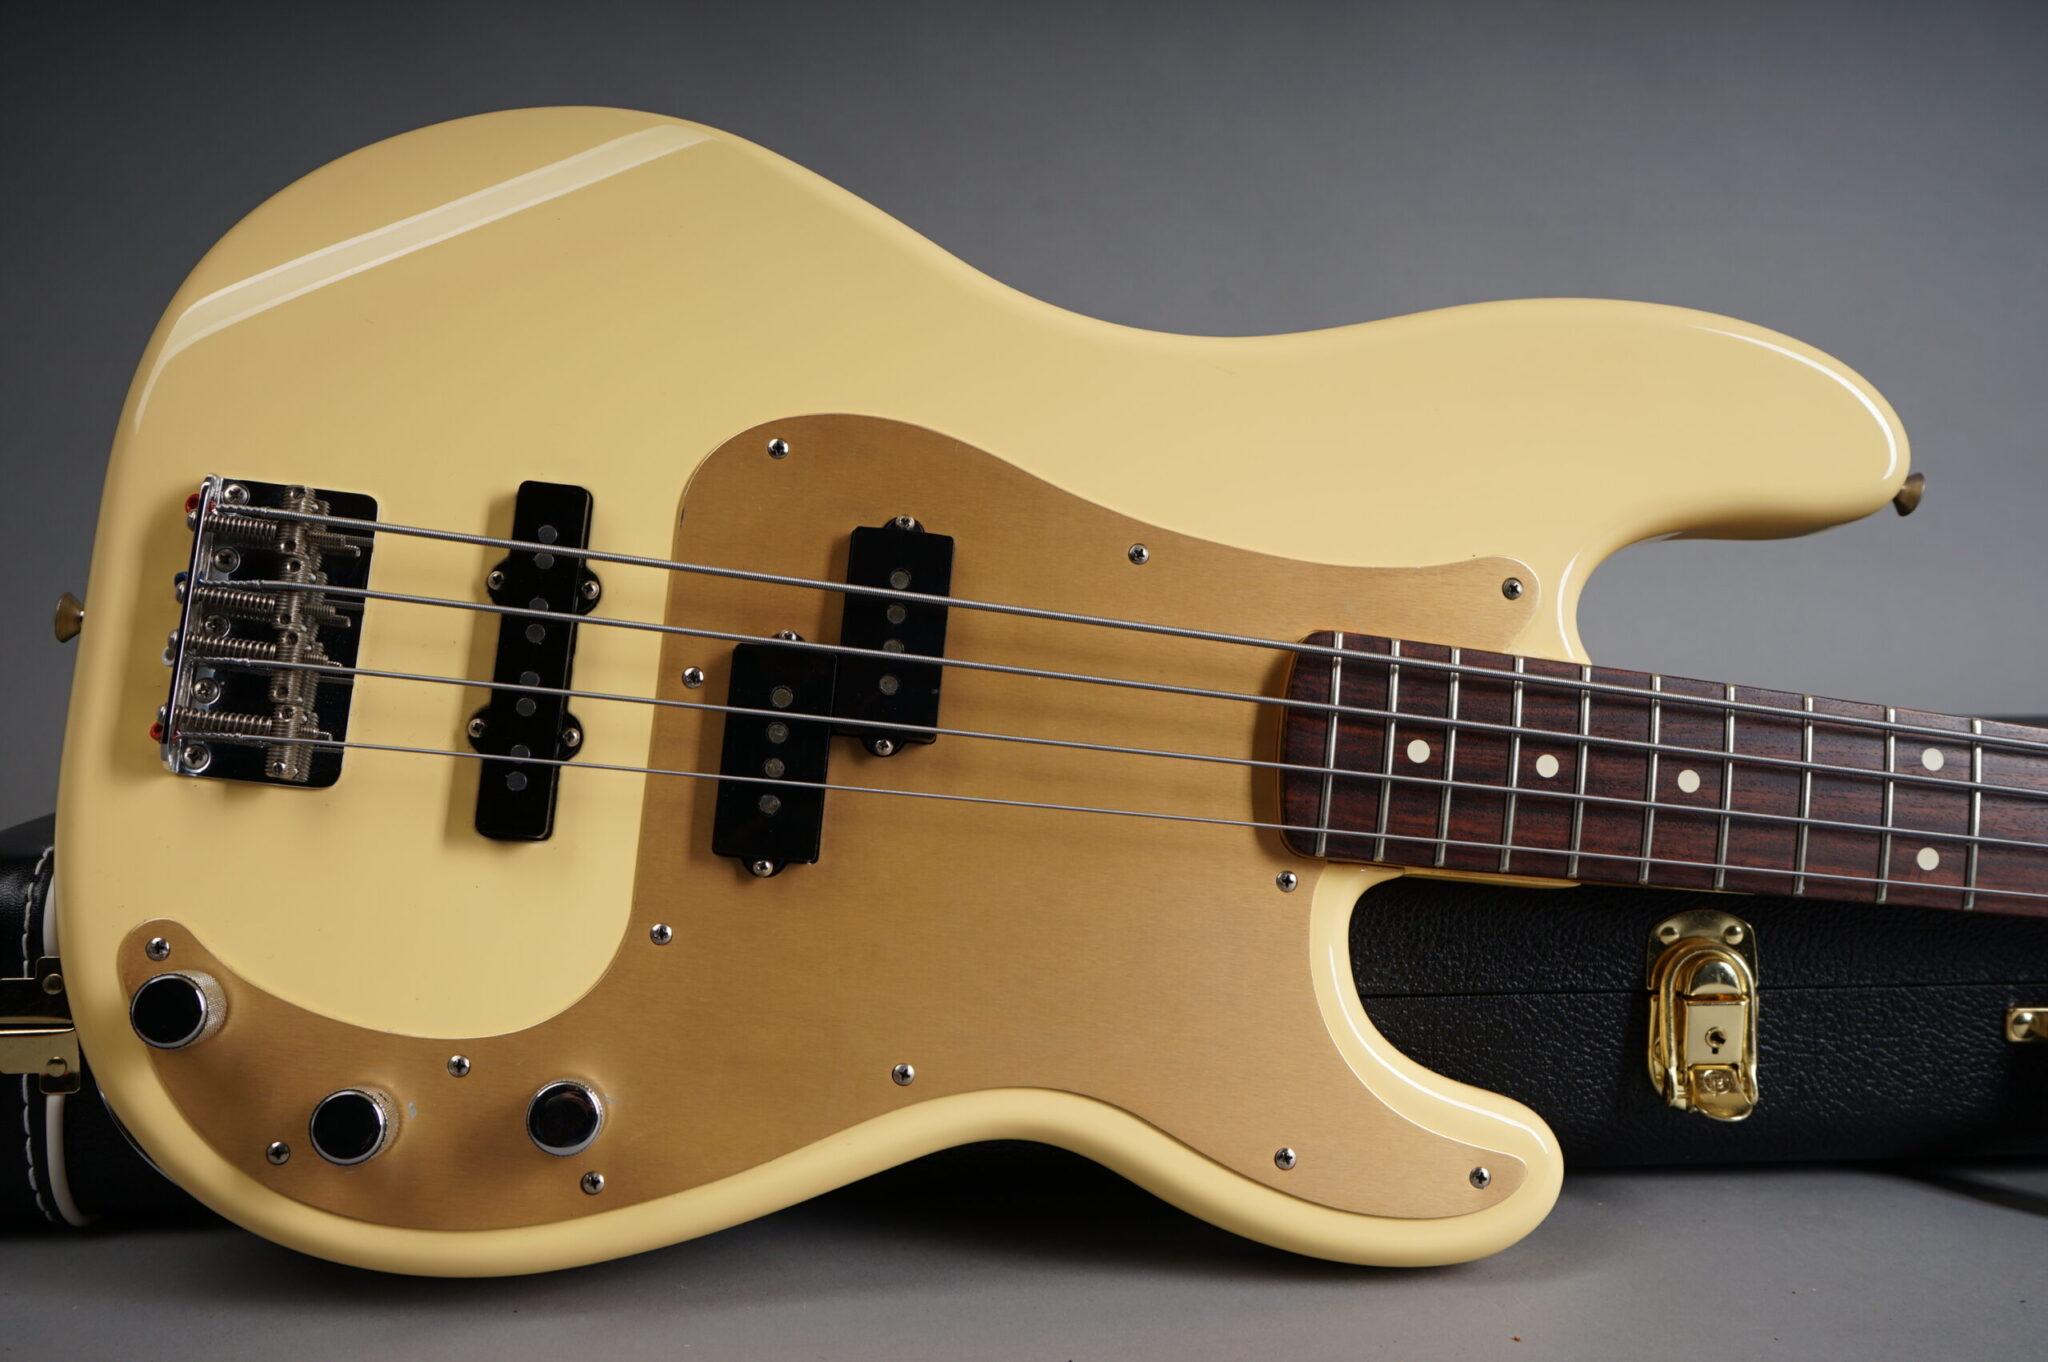 https://guitarpoint.de/app/uploads/products/1998-fender-precision-bass-special-white/1998-Fender-Cali-PJ-Bass-8-scaled-2048x1362.jpg